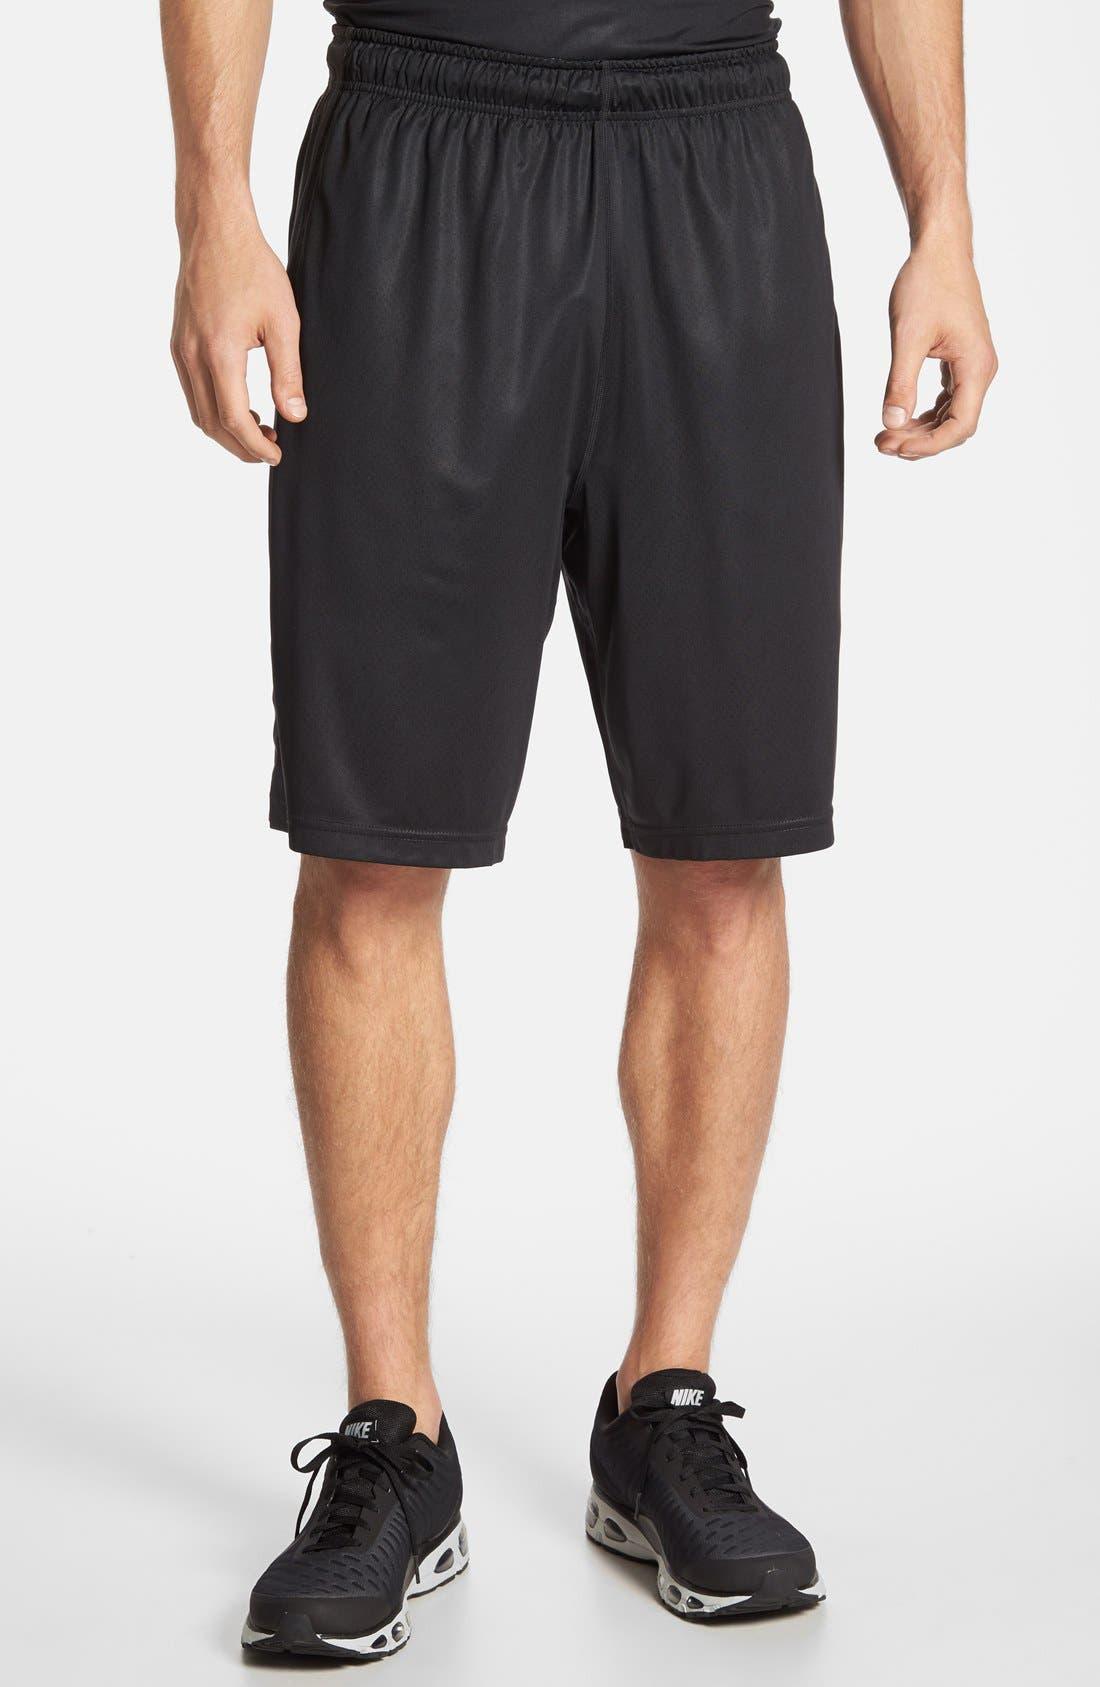 Alternate Image 1 Selected - Nike 'Fly Digital Rain' Shorts (Men)